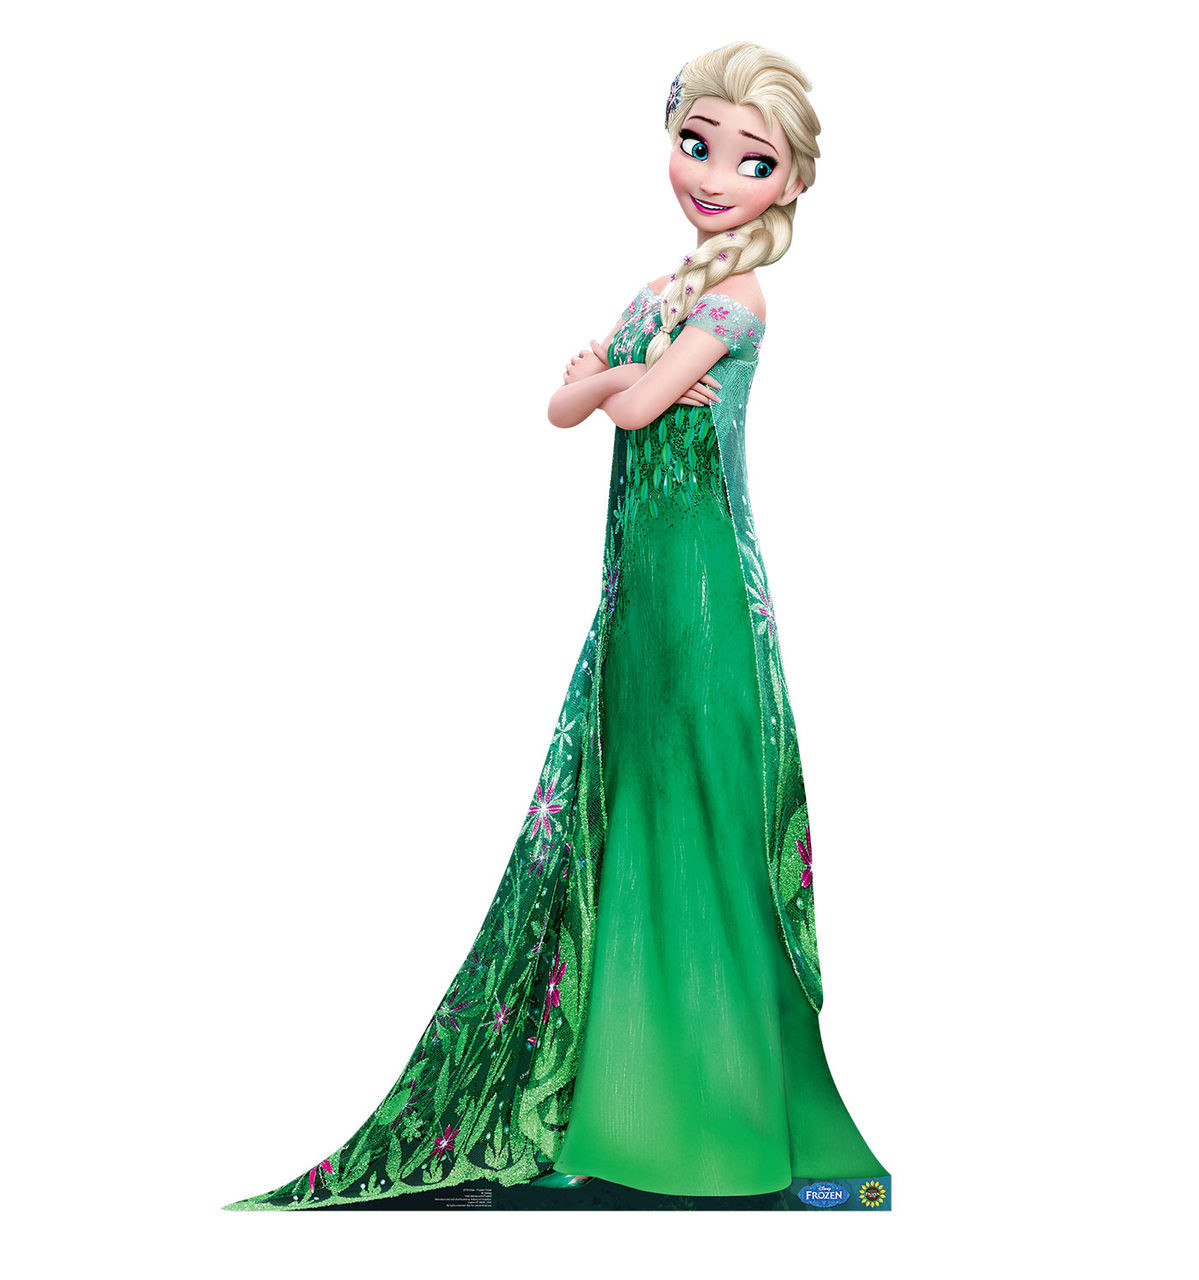 Life-size Elsa - Frozen Fever Cardboard Standup 2